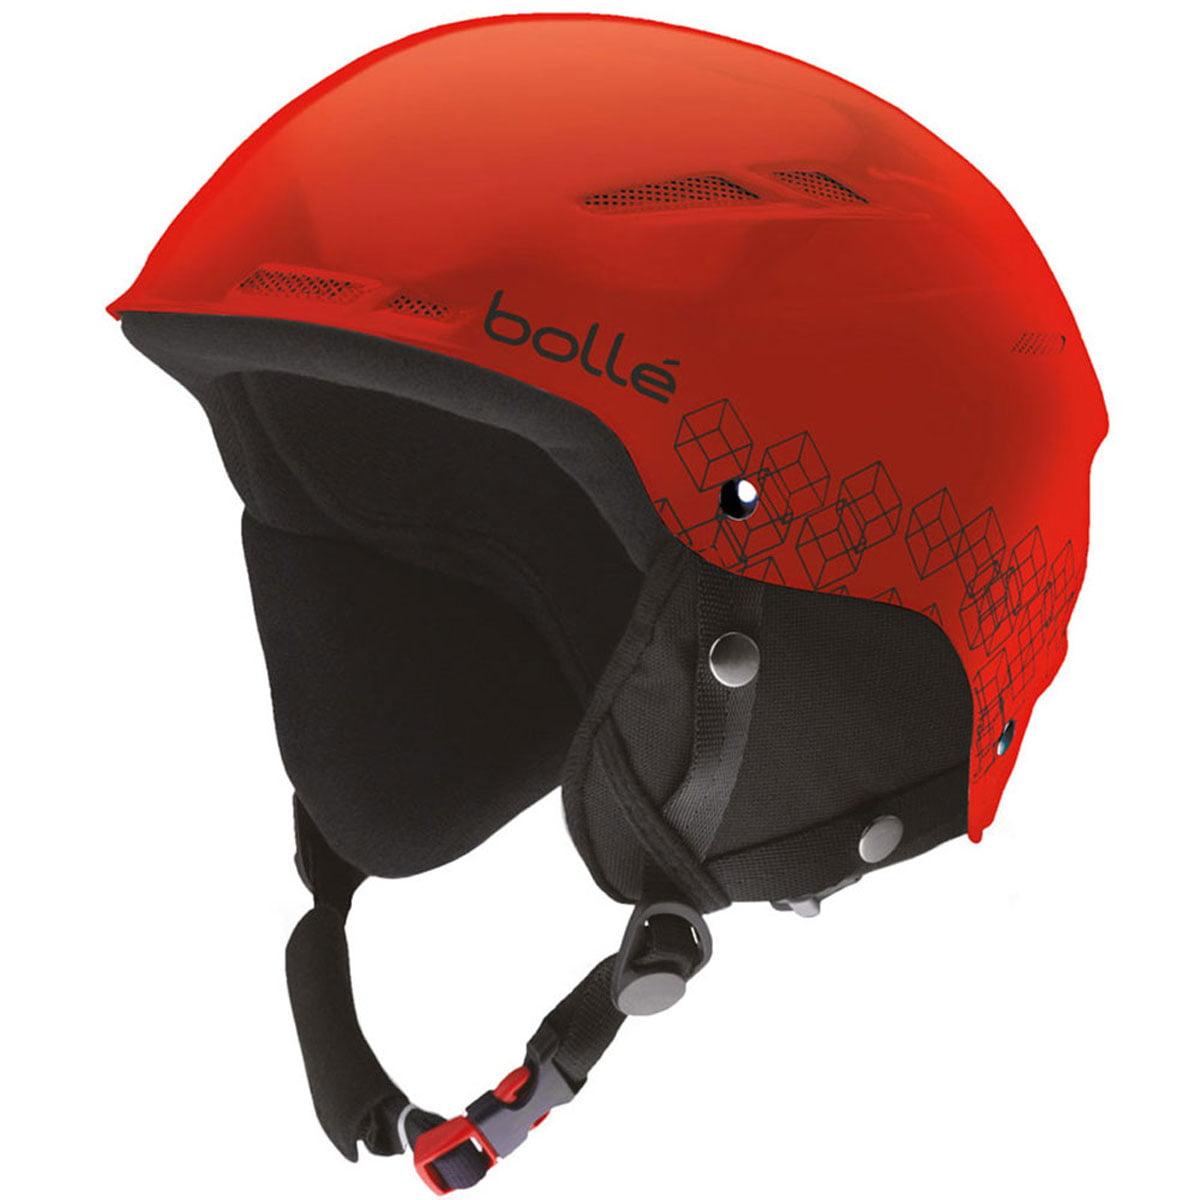 Bolle B-Rent Jr. Ski Helmet by Bolle